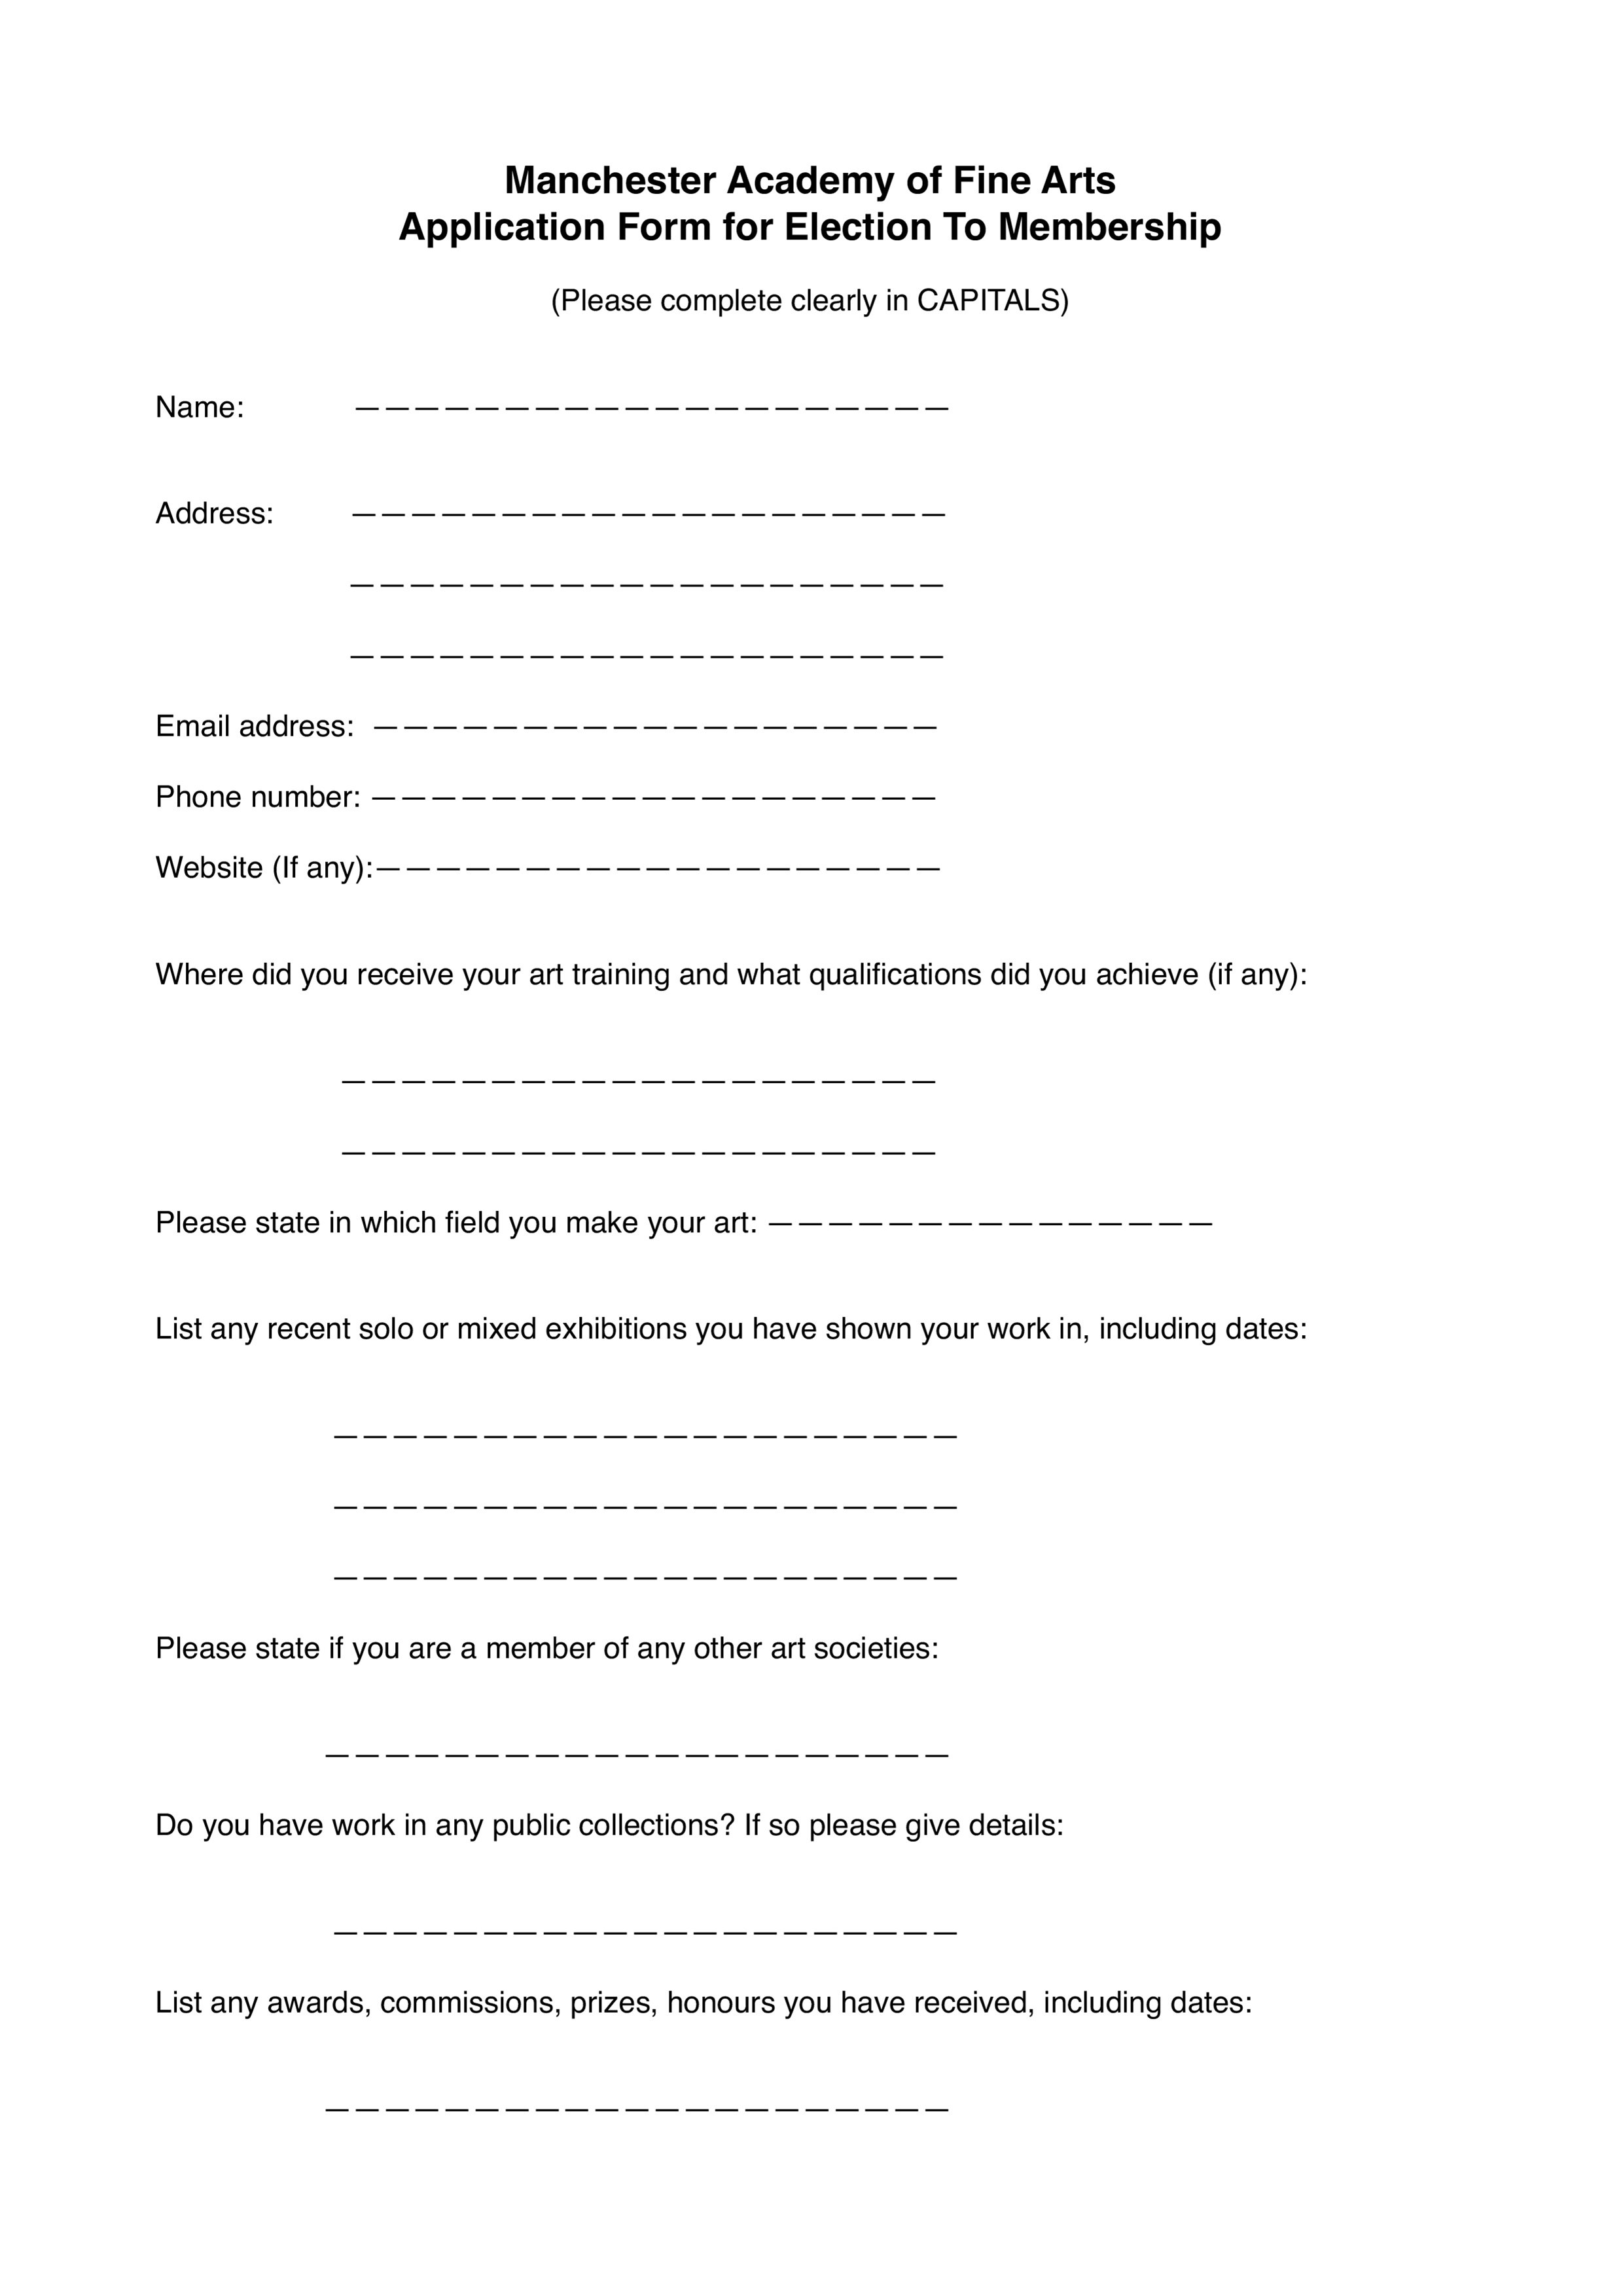 MAFA 2019 Application Form